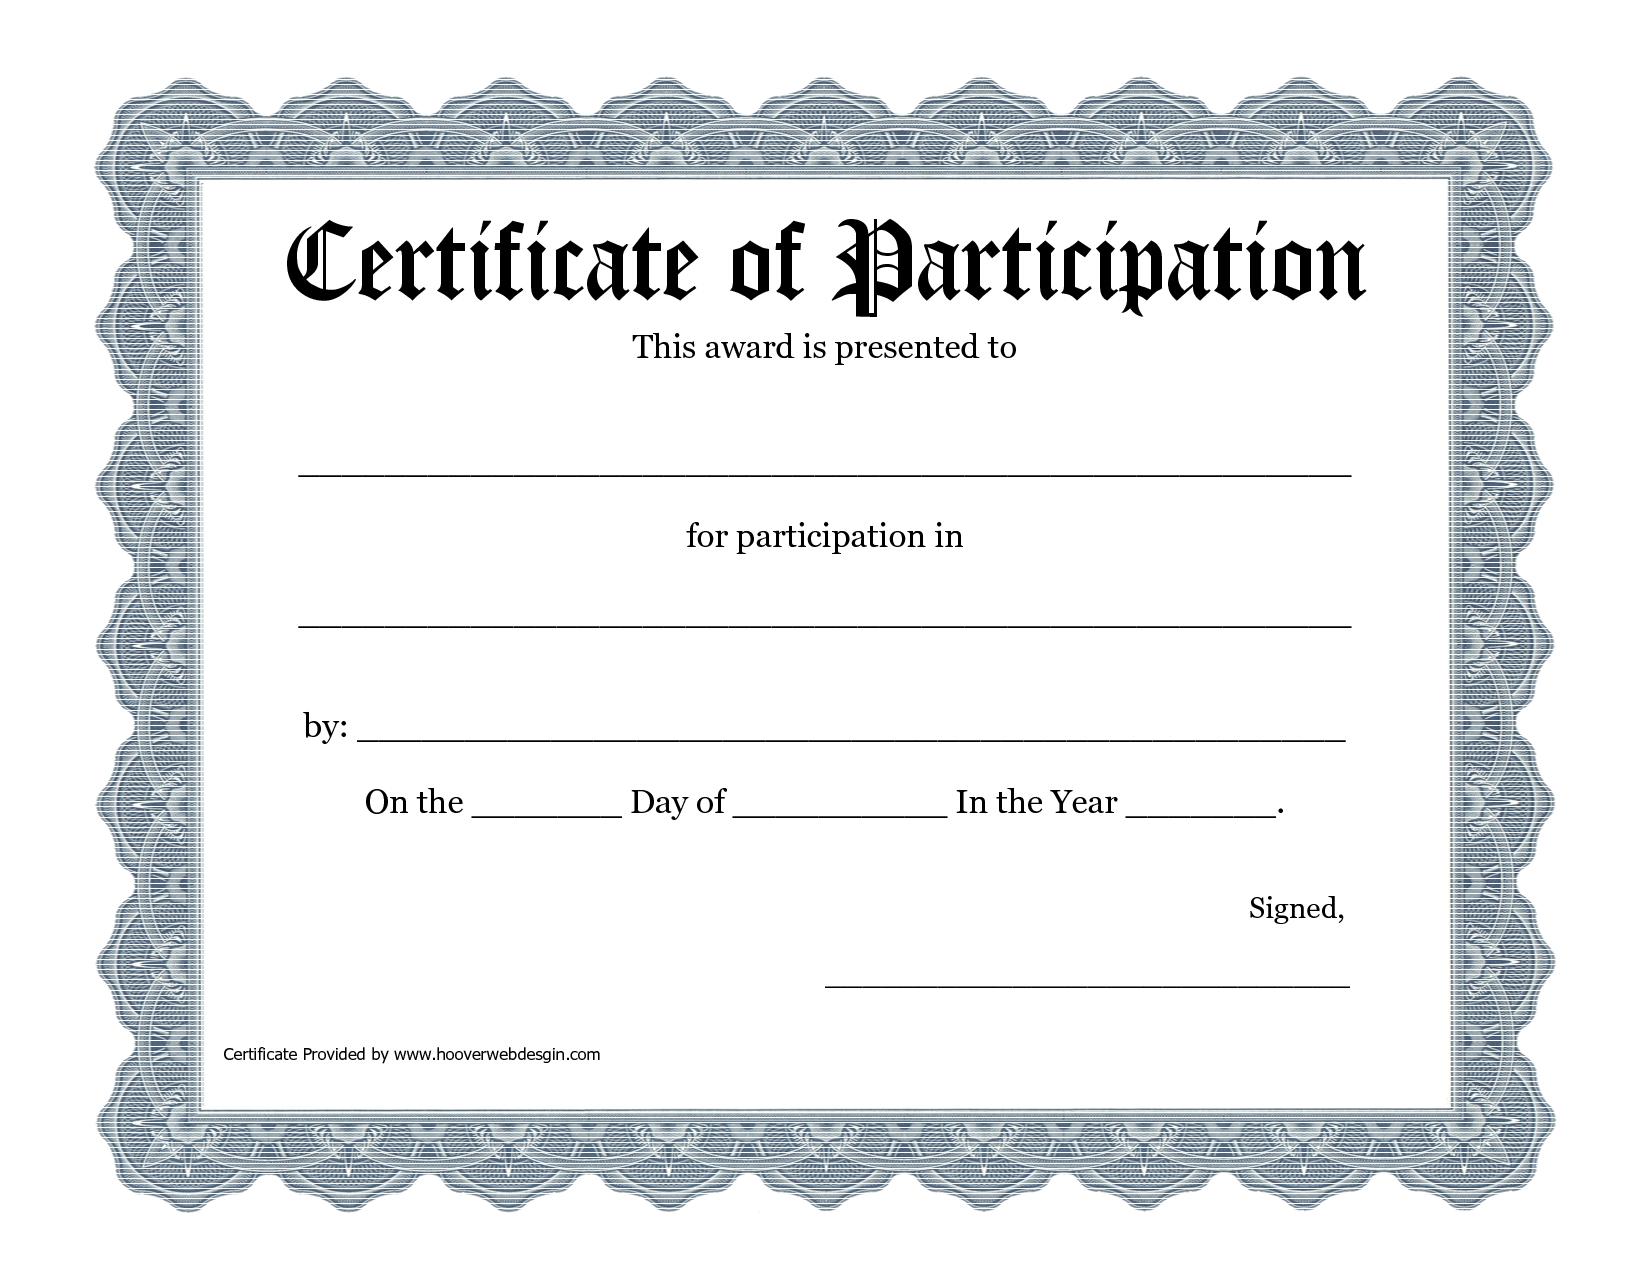 Free Printable Award Certificate Template  Bing Images   Art Regarding Soccer Award Certificate Templates Free